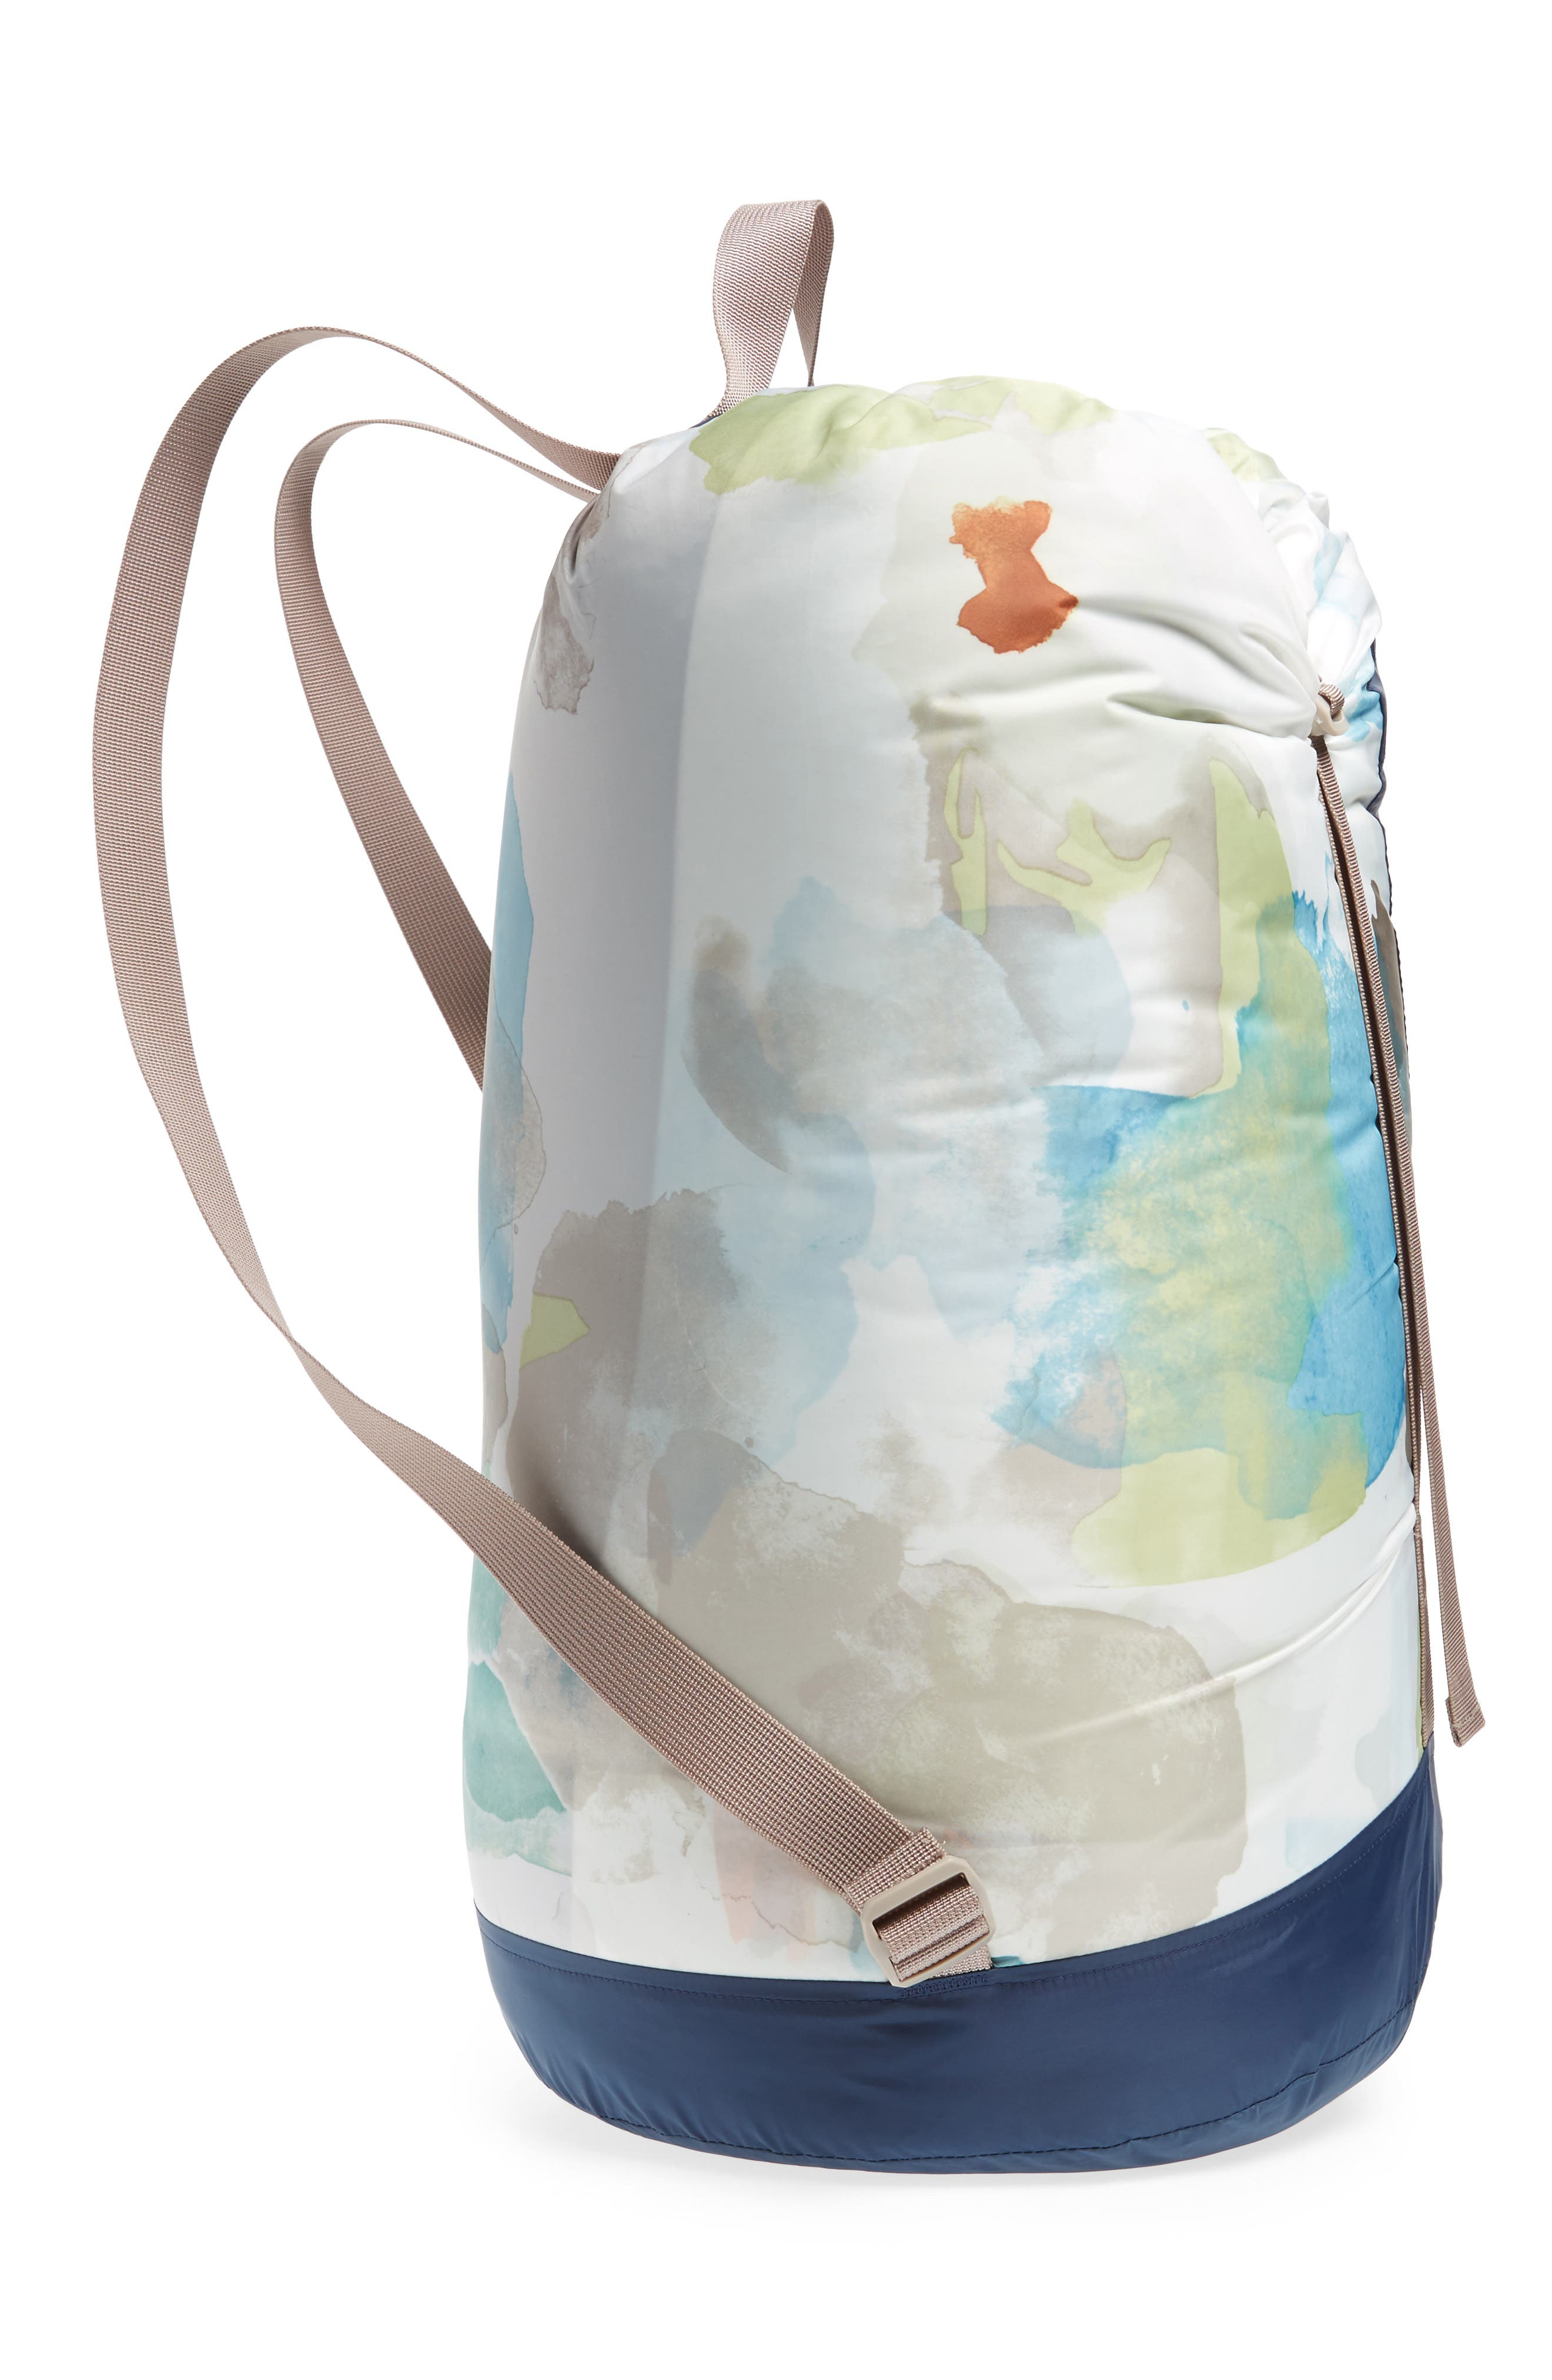 Homestead Twin Extra-Large Sleeping Bag,                             Alternate thumbnail 2, color,                             100